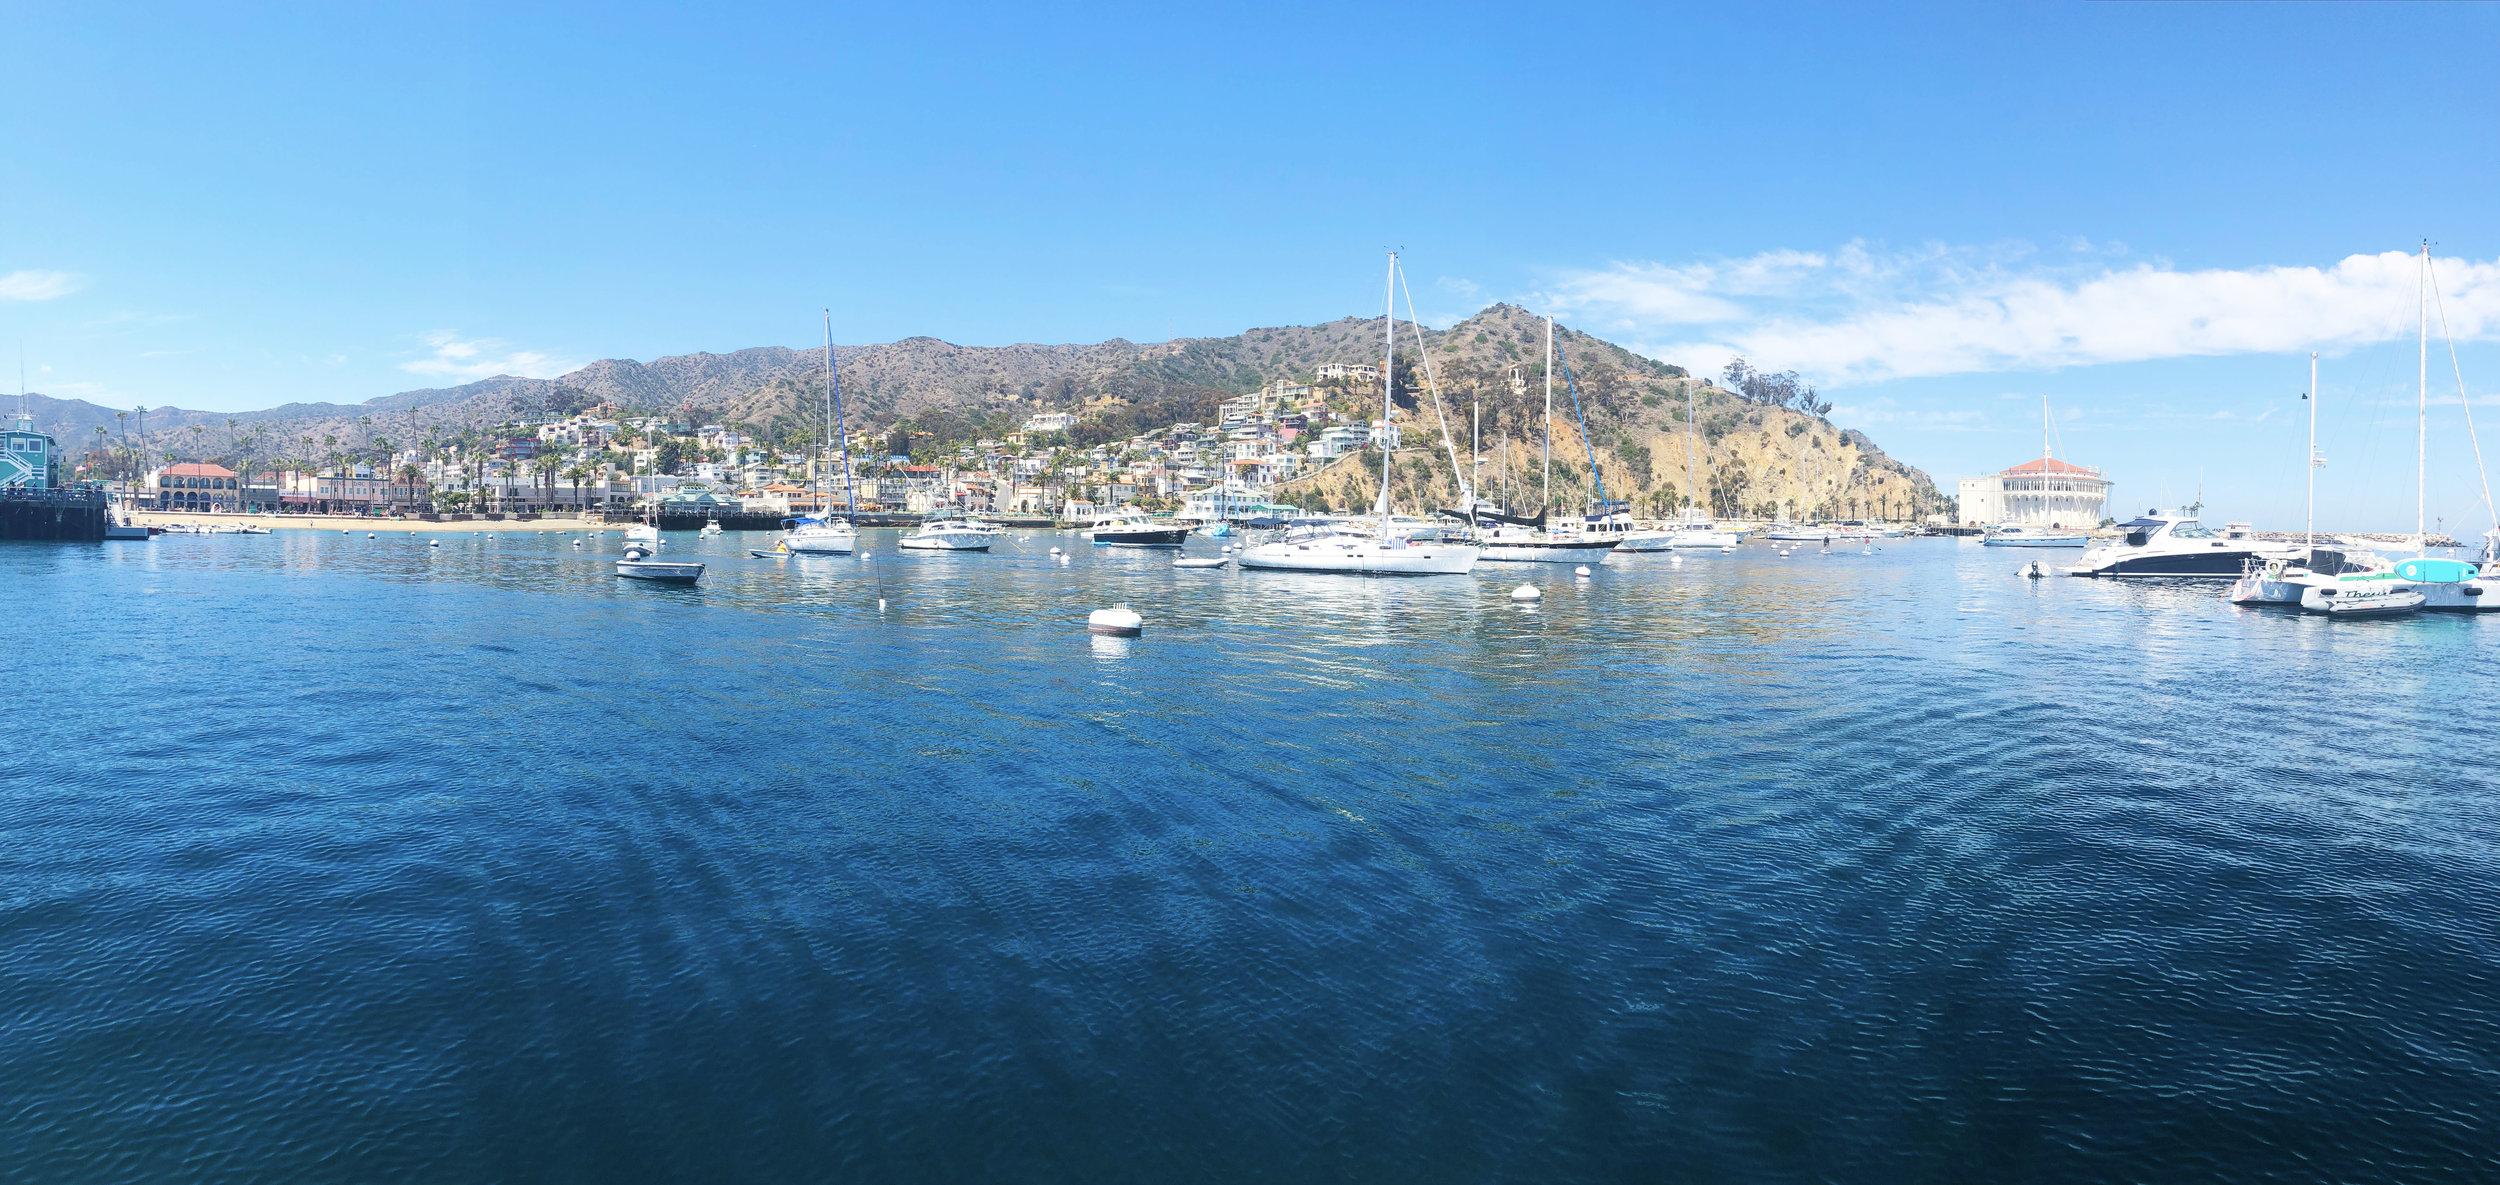 Panoramic views of Catalina